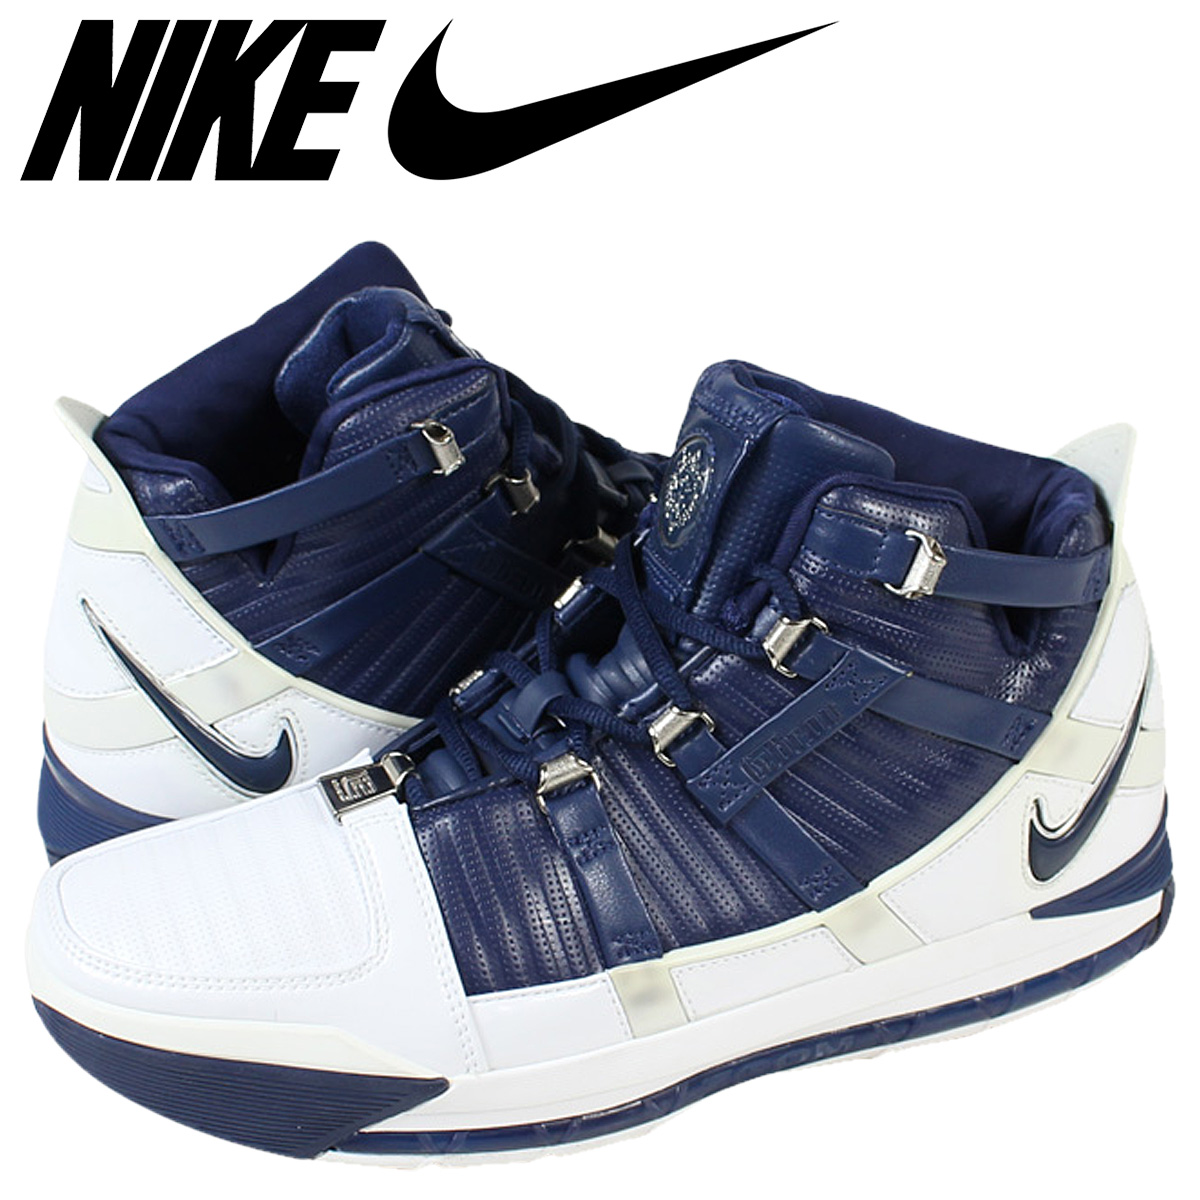 6fa16fdb7af ALLSPORTS  NIKE Nike LeBron sneakers ZOOM LEBRON 3 312147-141 Navy ...